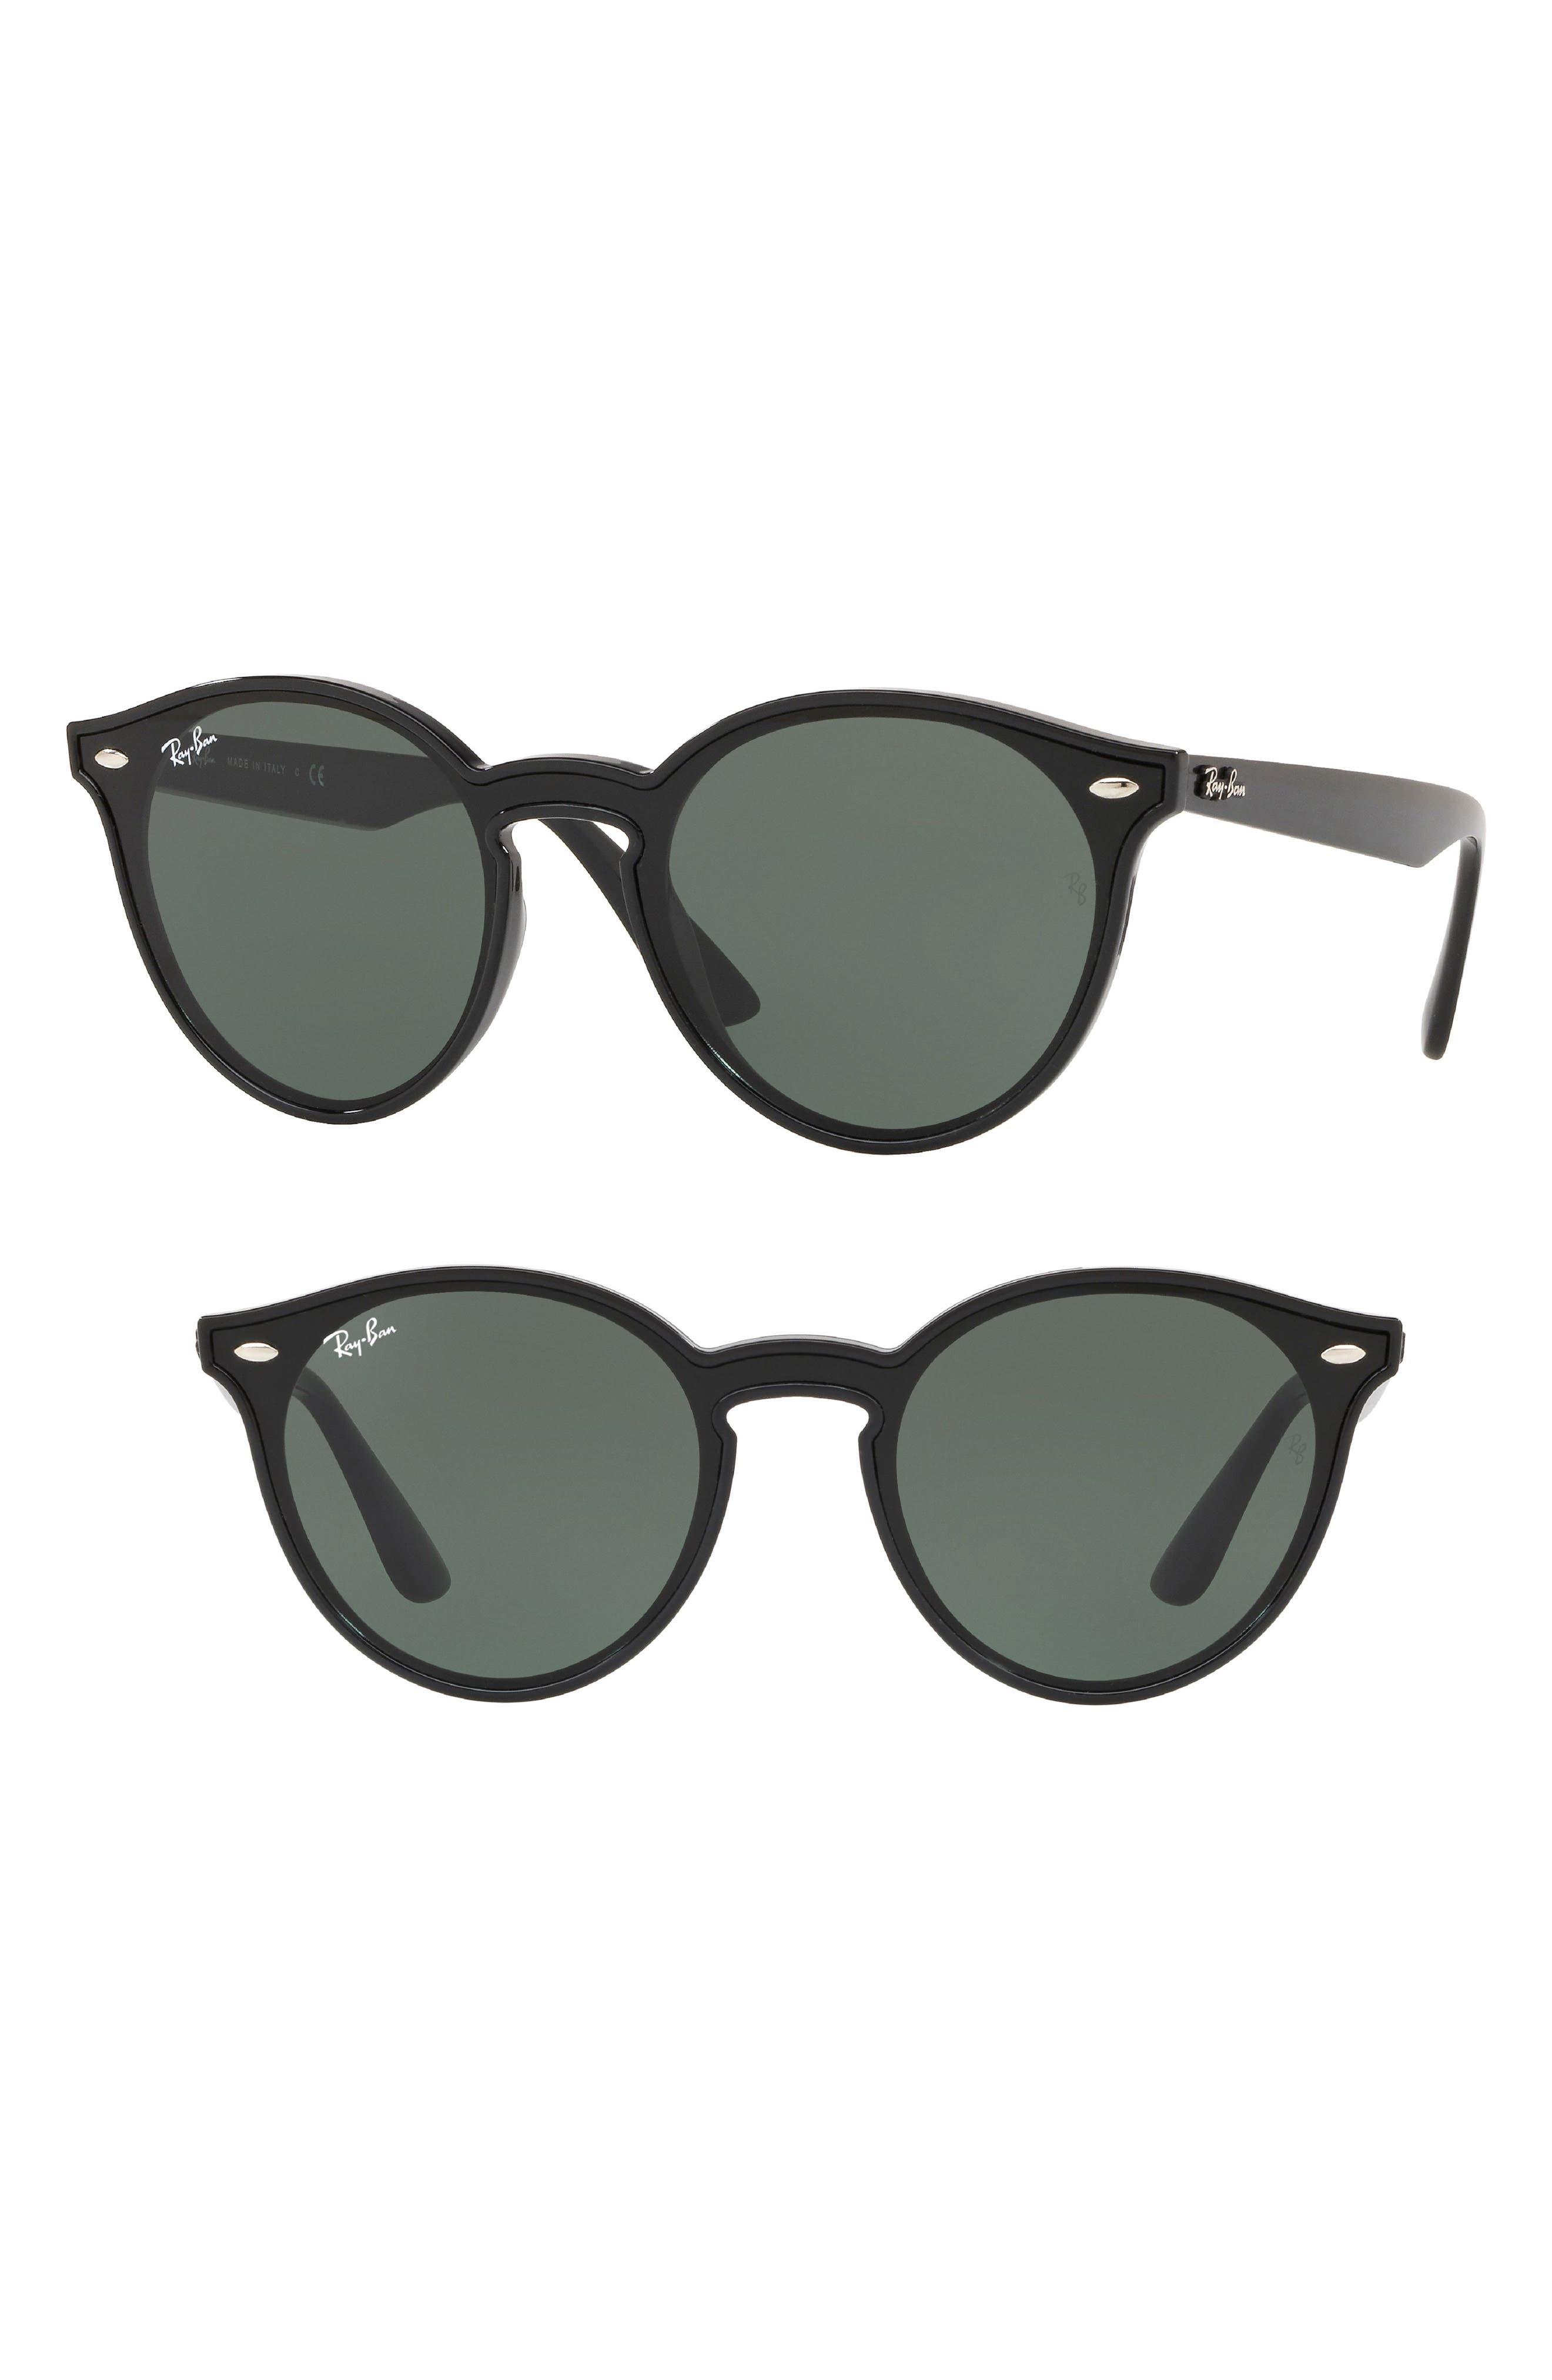 Ray Sunglasses Round Nordstrom Sunglasses Ray Nordstrom Ban Round Round Ban Ray Sunglasses Nordstrom Ban Round z8ddwB